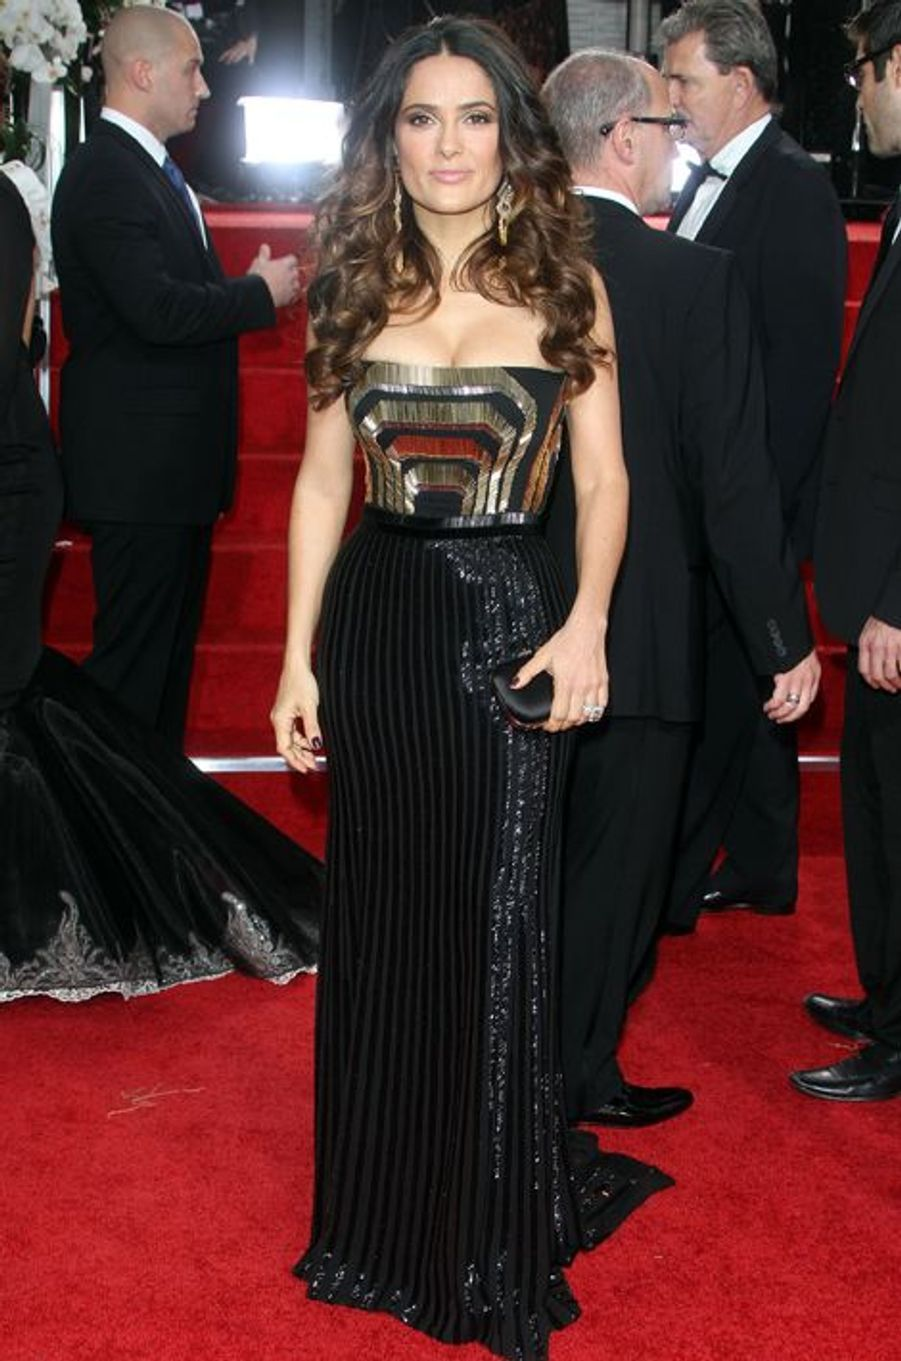 Salma Hayek en Gucci aux Golden Globes, en janvier 2012